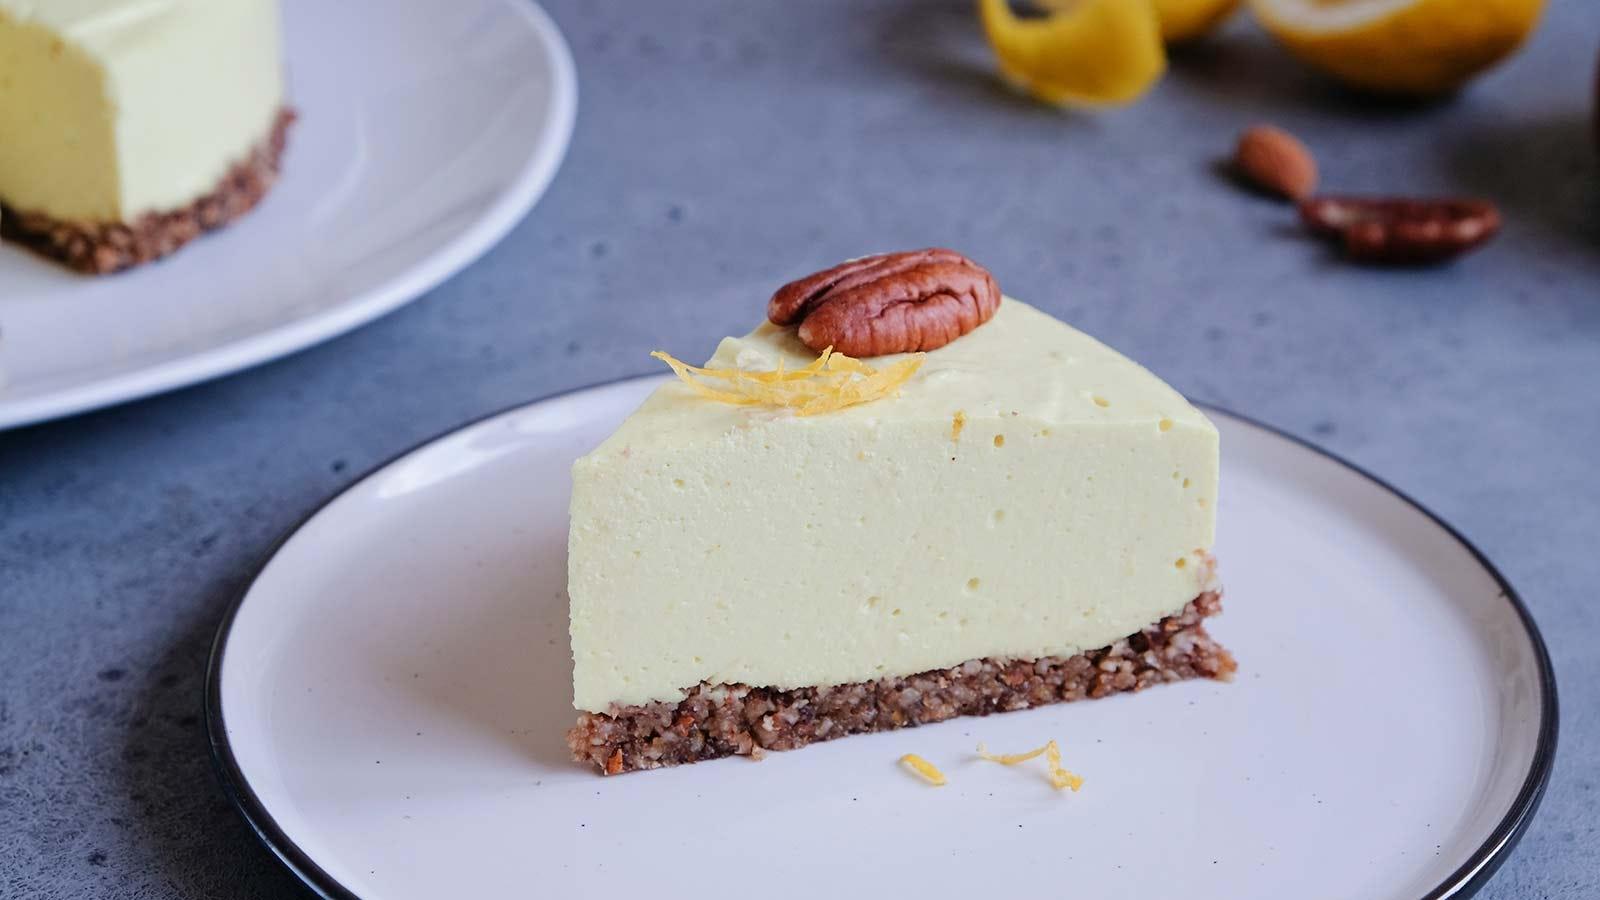 A slice of raw vegan lemon cheesecake on a white plate.